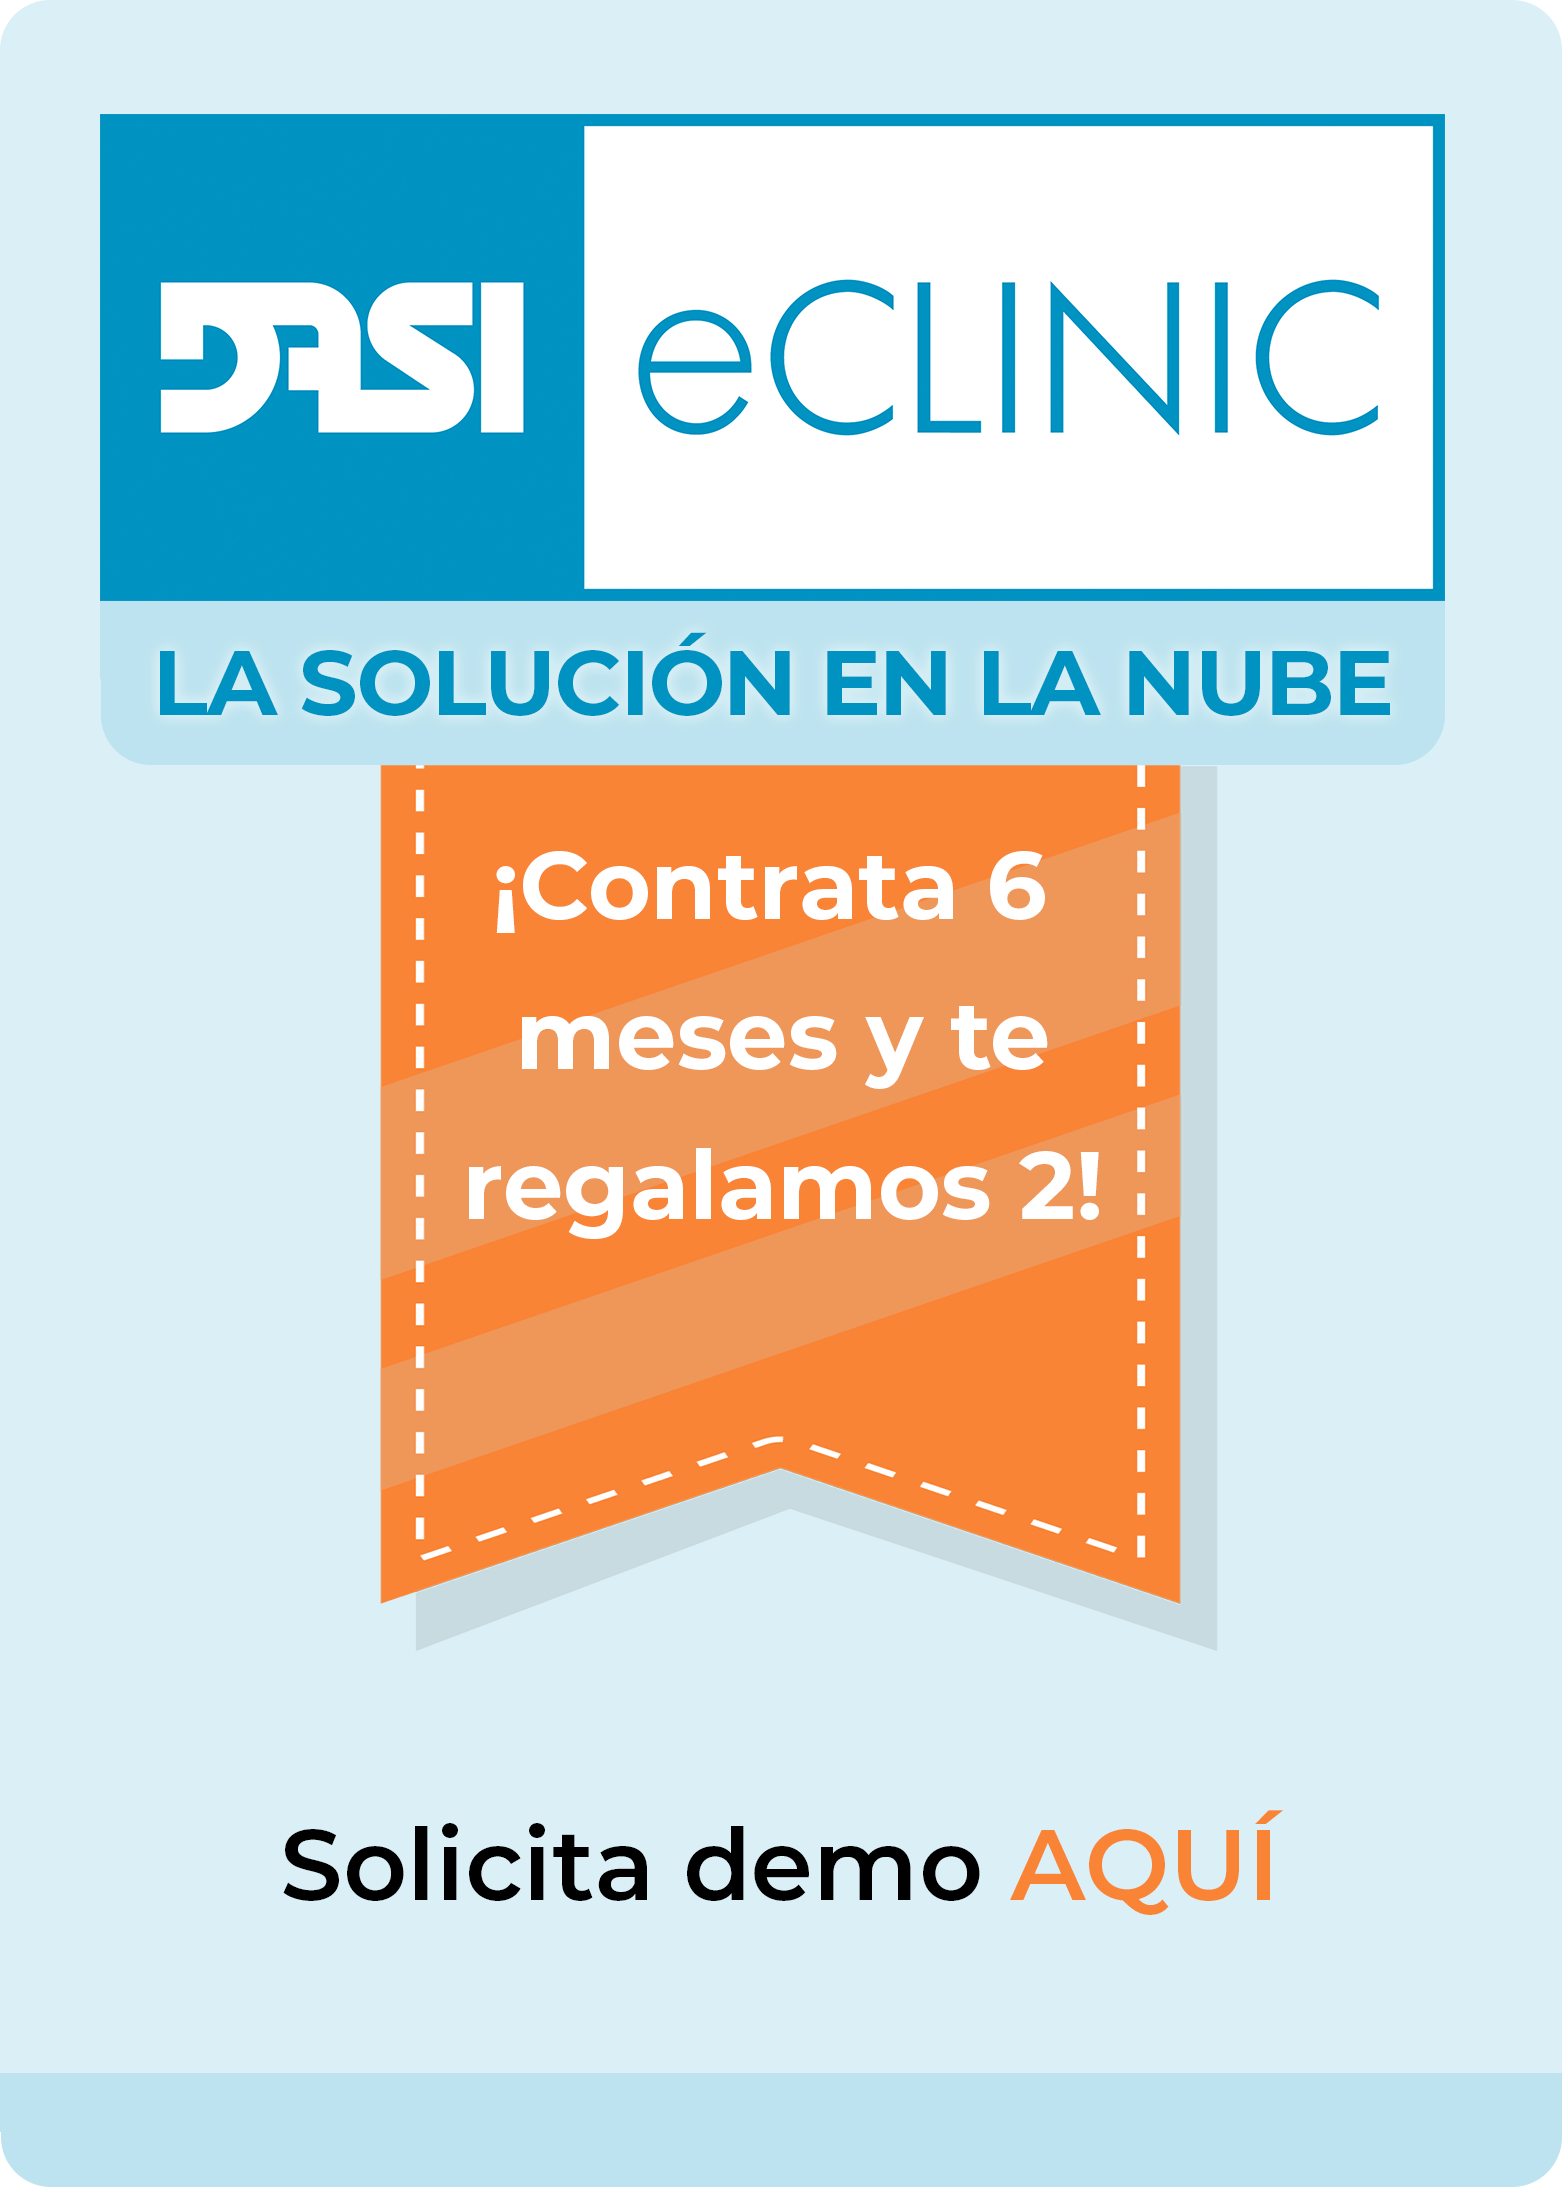 gestion medica online gratis